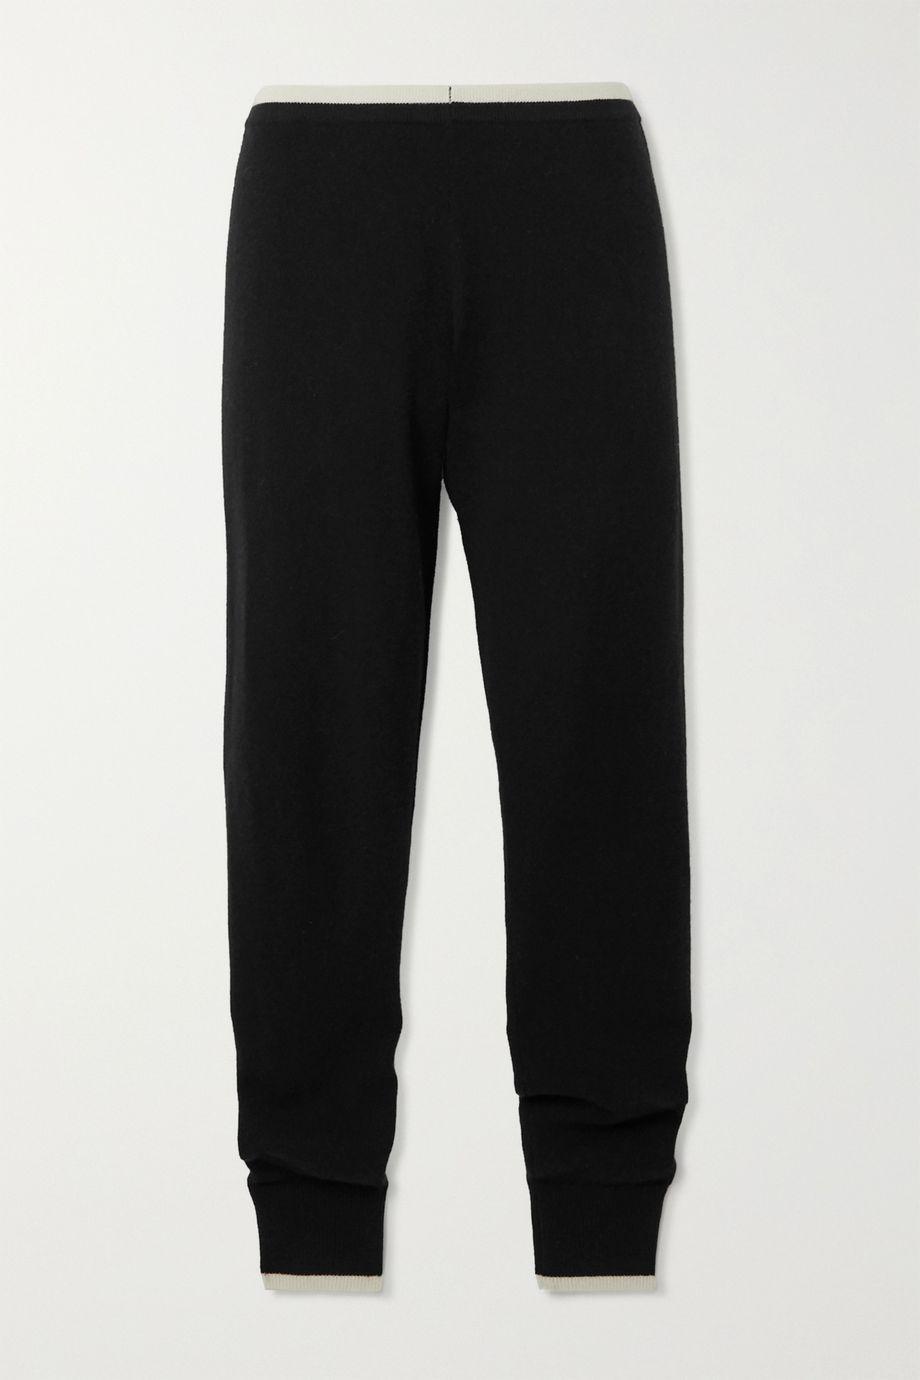 Madeleine Thompson Plutus two-tone cashmere slim-fit track pants